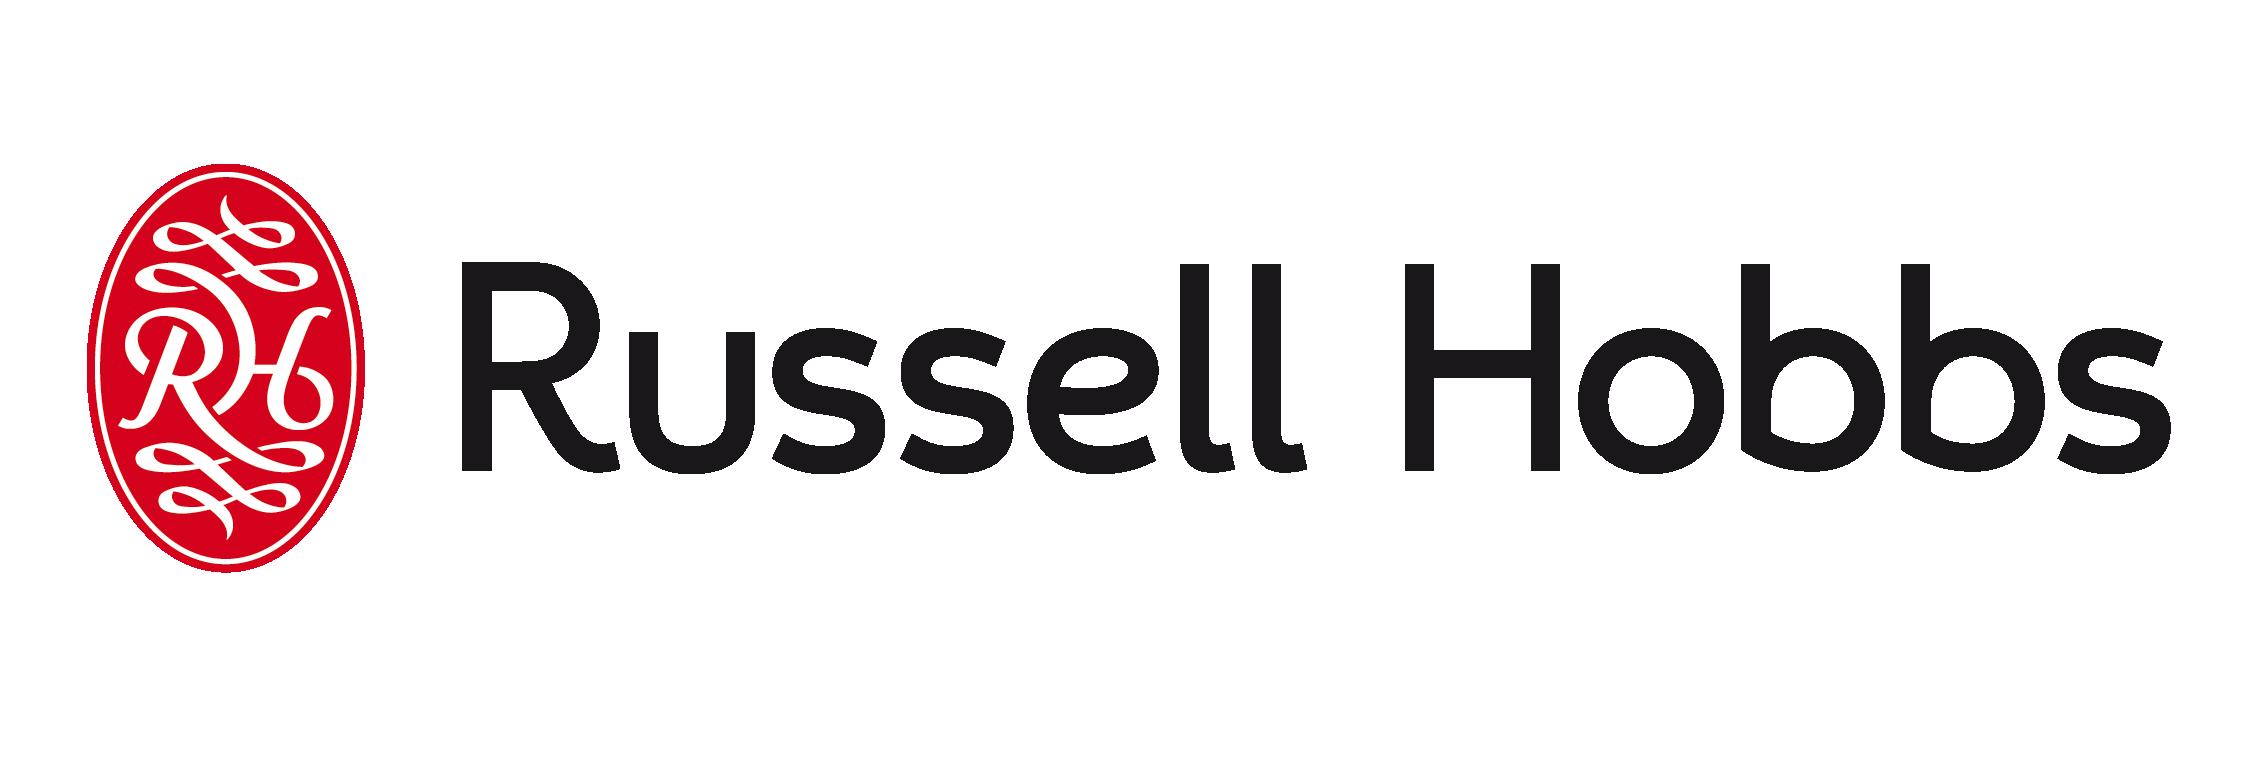 Russell Hobbs Logo Linear